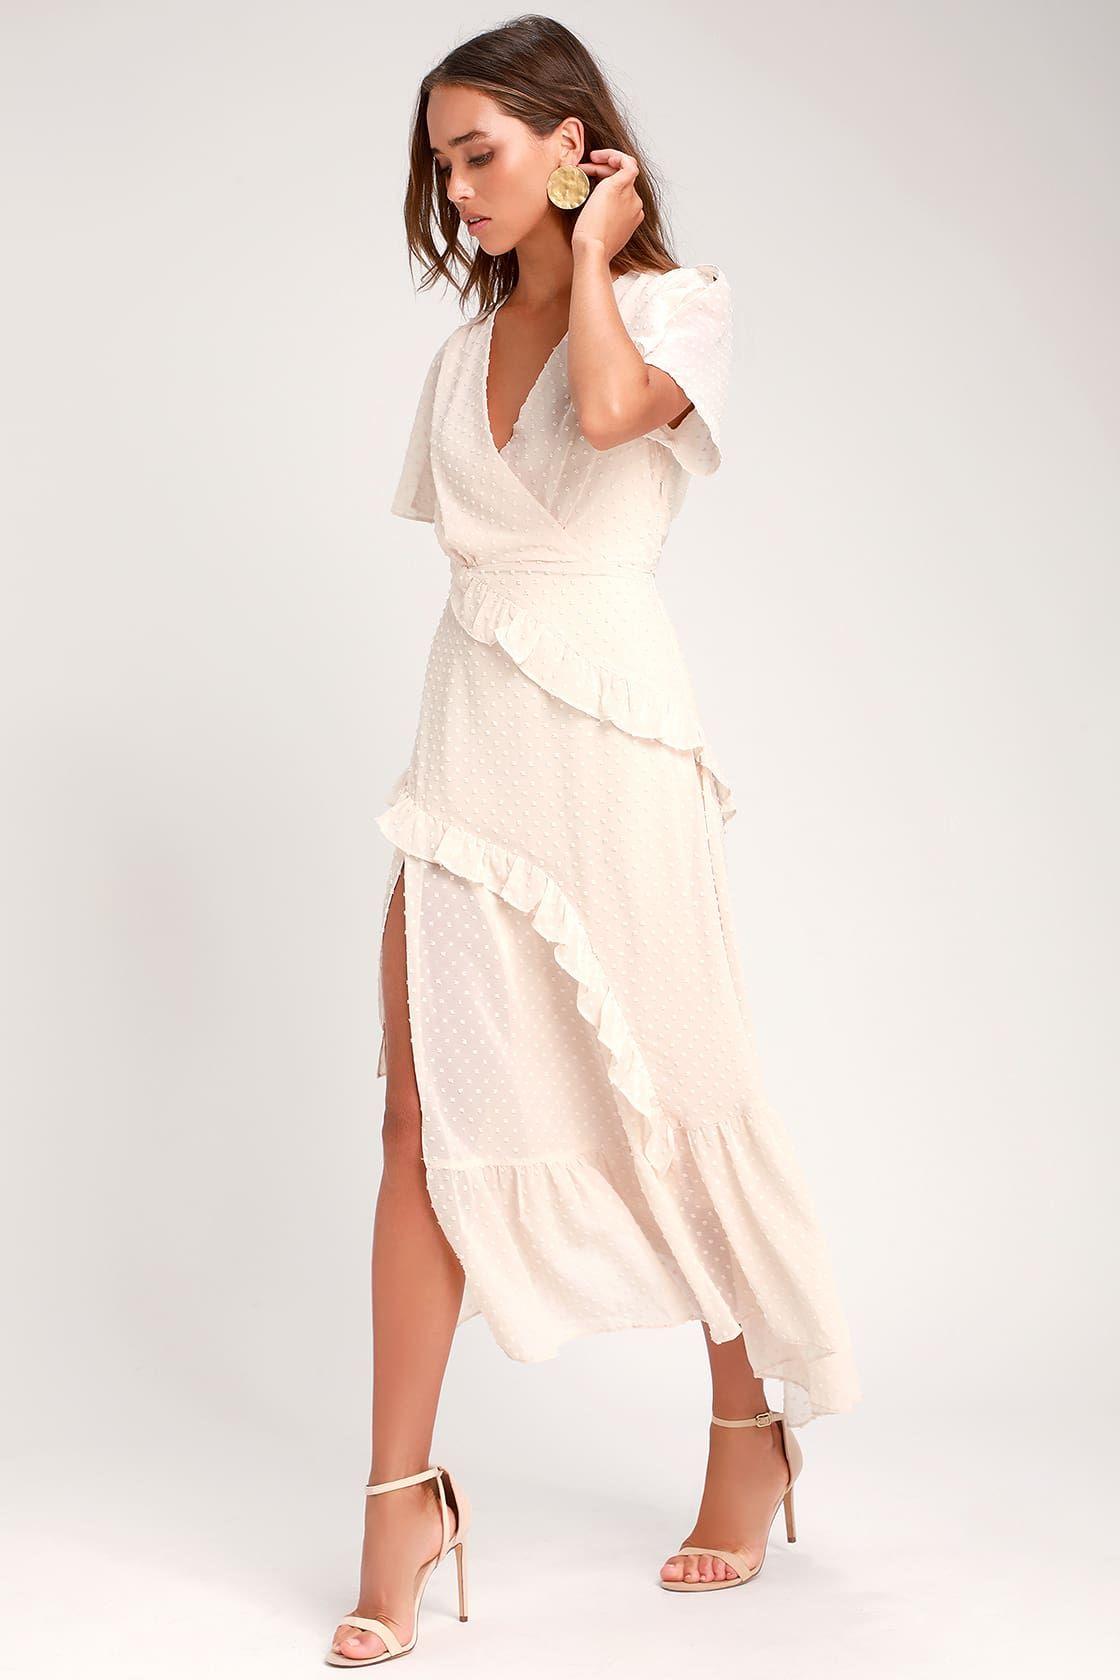 Next To You Cream Swiss Dot Ruffled Midi Dress Midi Ruffle Dress Cream Dress Outfit White Midi Dress [ 1680 x 1120 Pixel ]